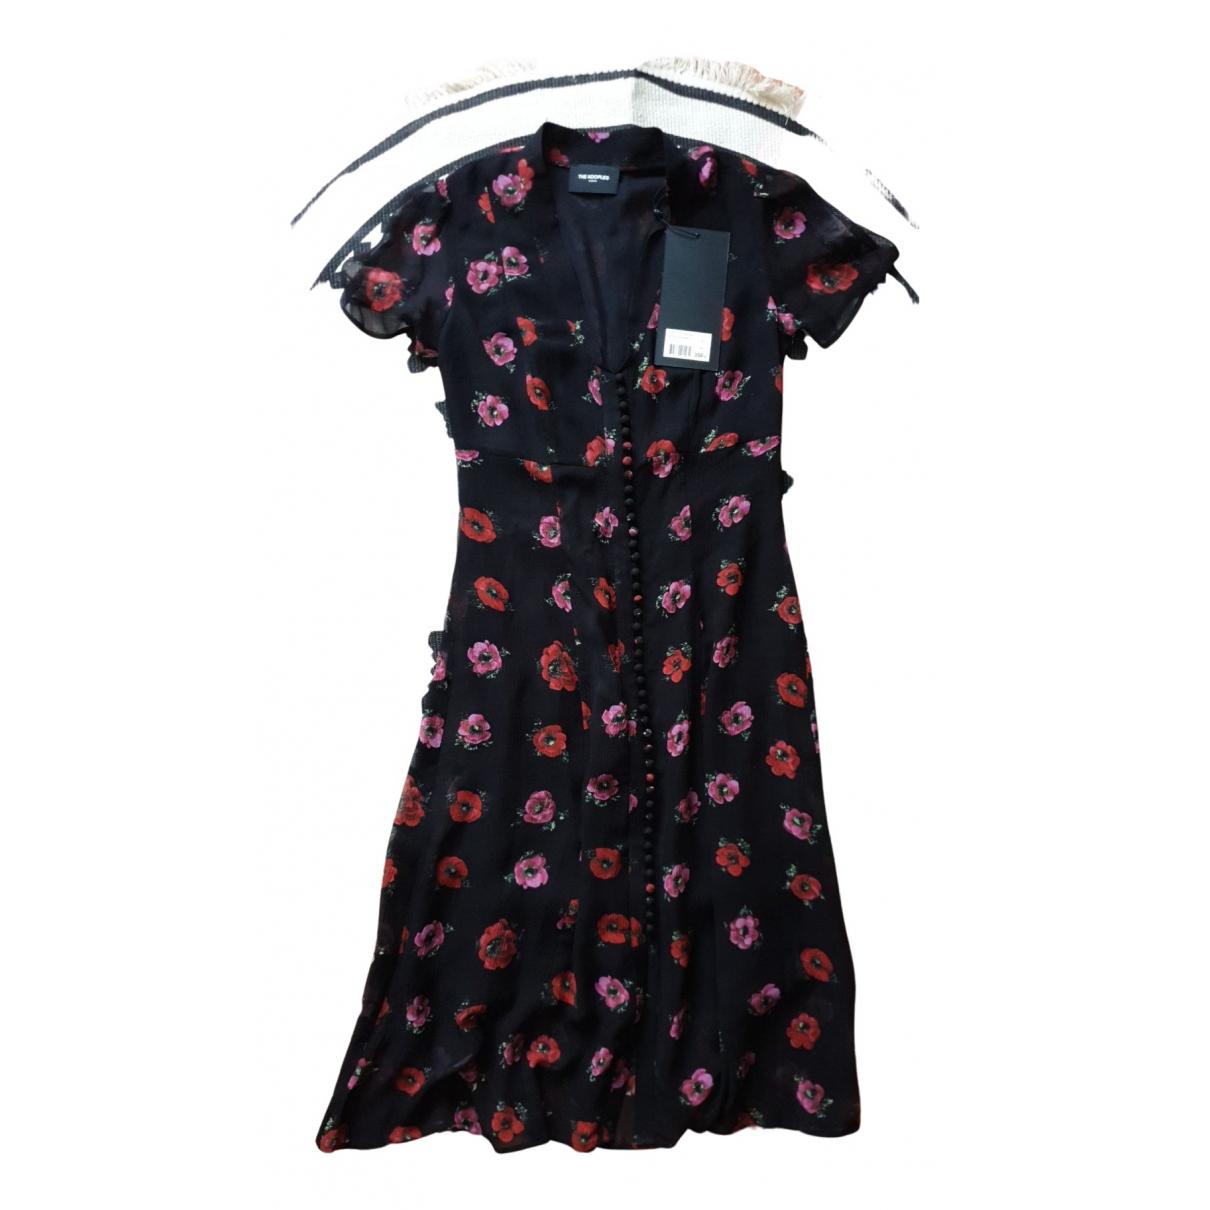 The Kooples Spring Summer 2019 Black Silk dress for Women 36 FR